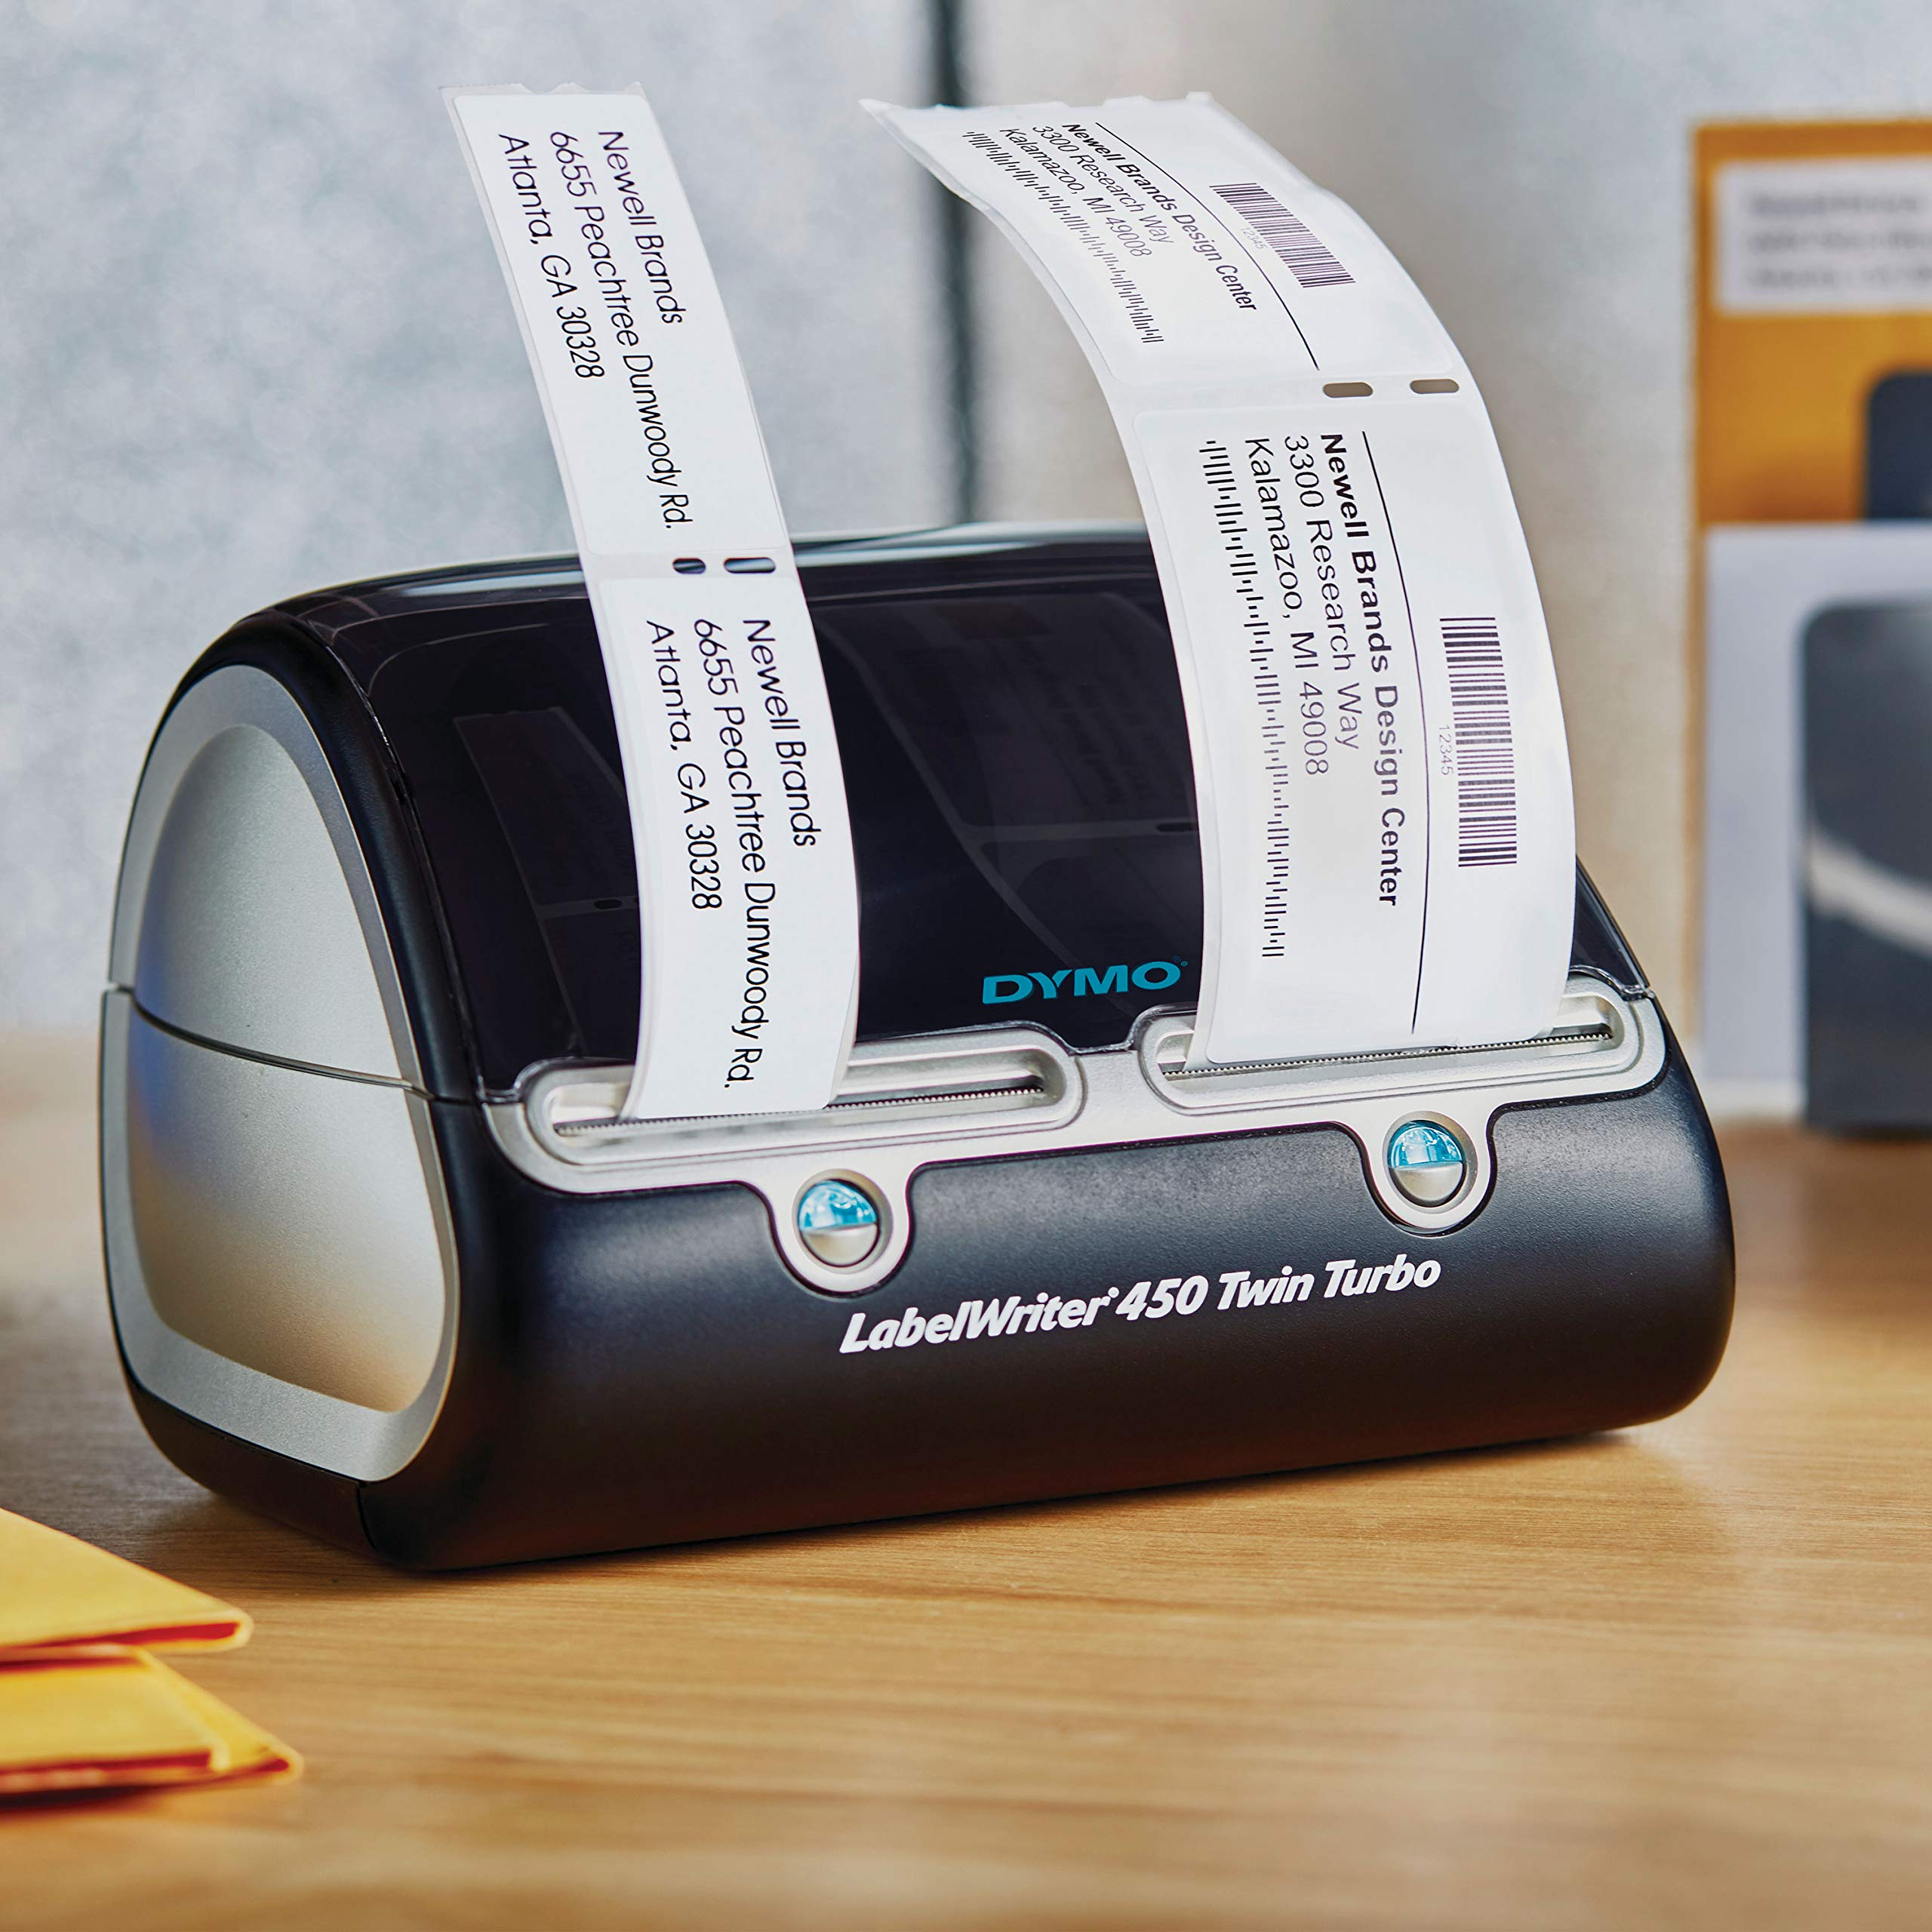 DYMO Label Writer 450 Twin Turbo Label Printer, 71 Labels